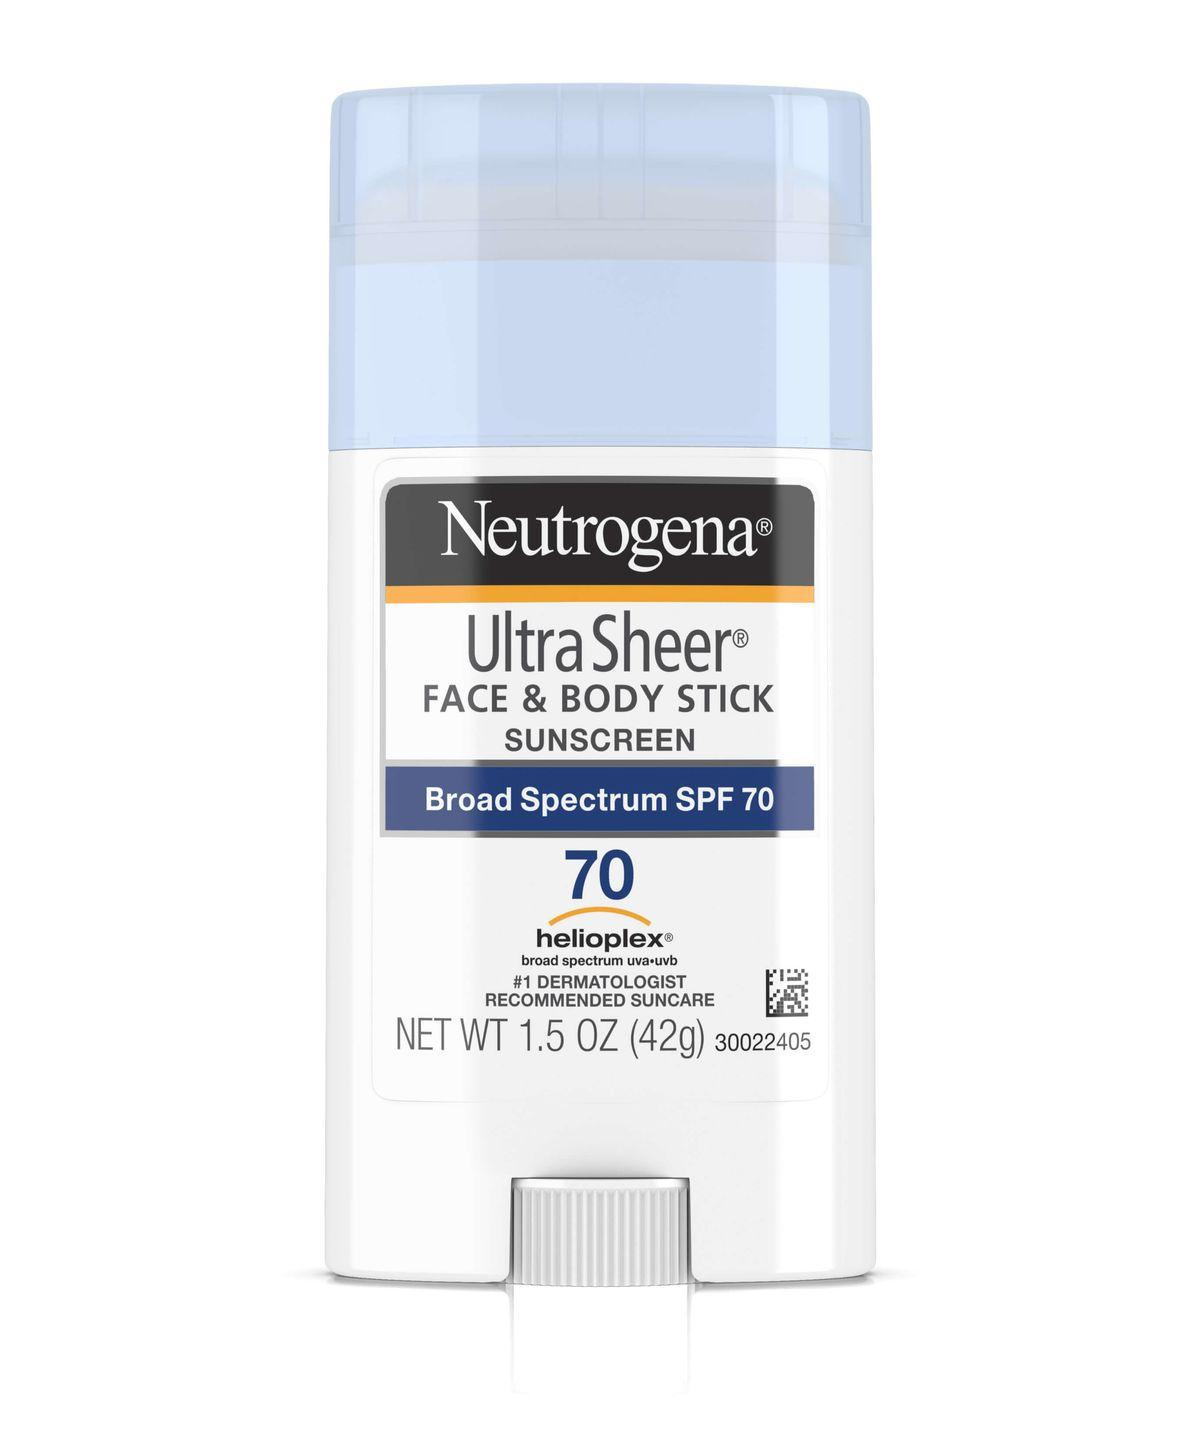 Neutrogena Ultra Sheer Face + Body Stick Sunscreen Broad Spectrum SPF 70